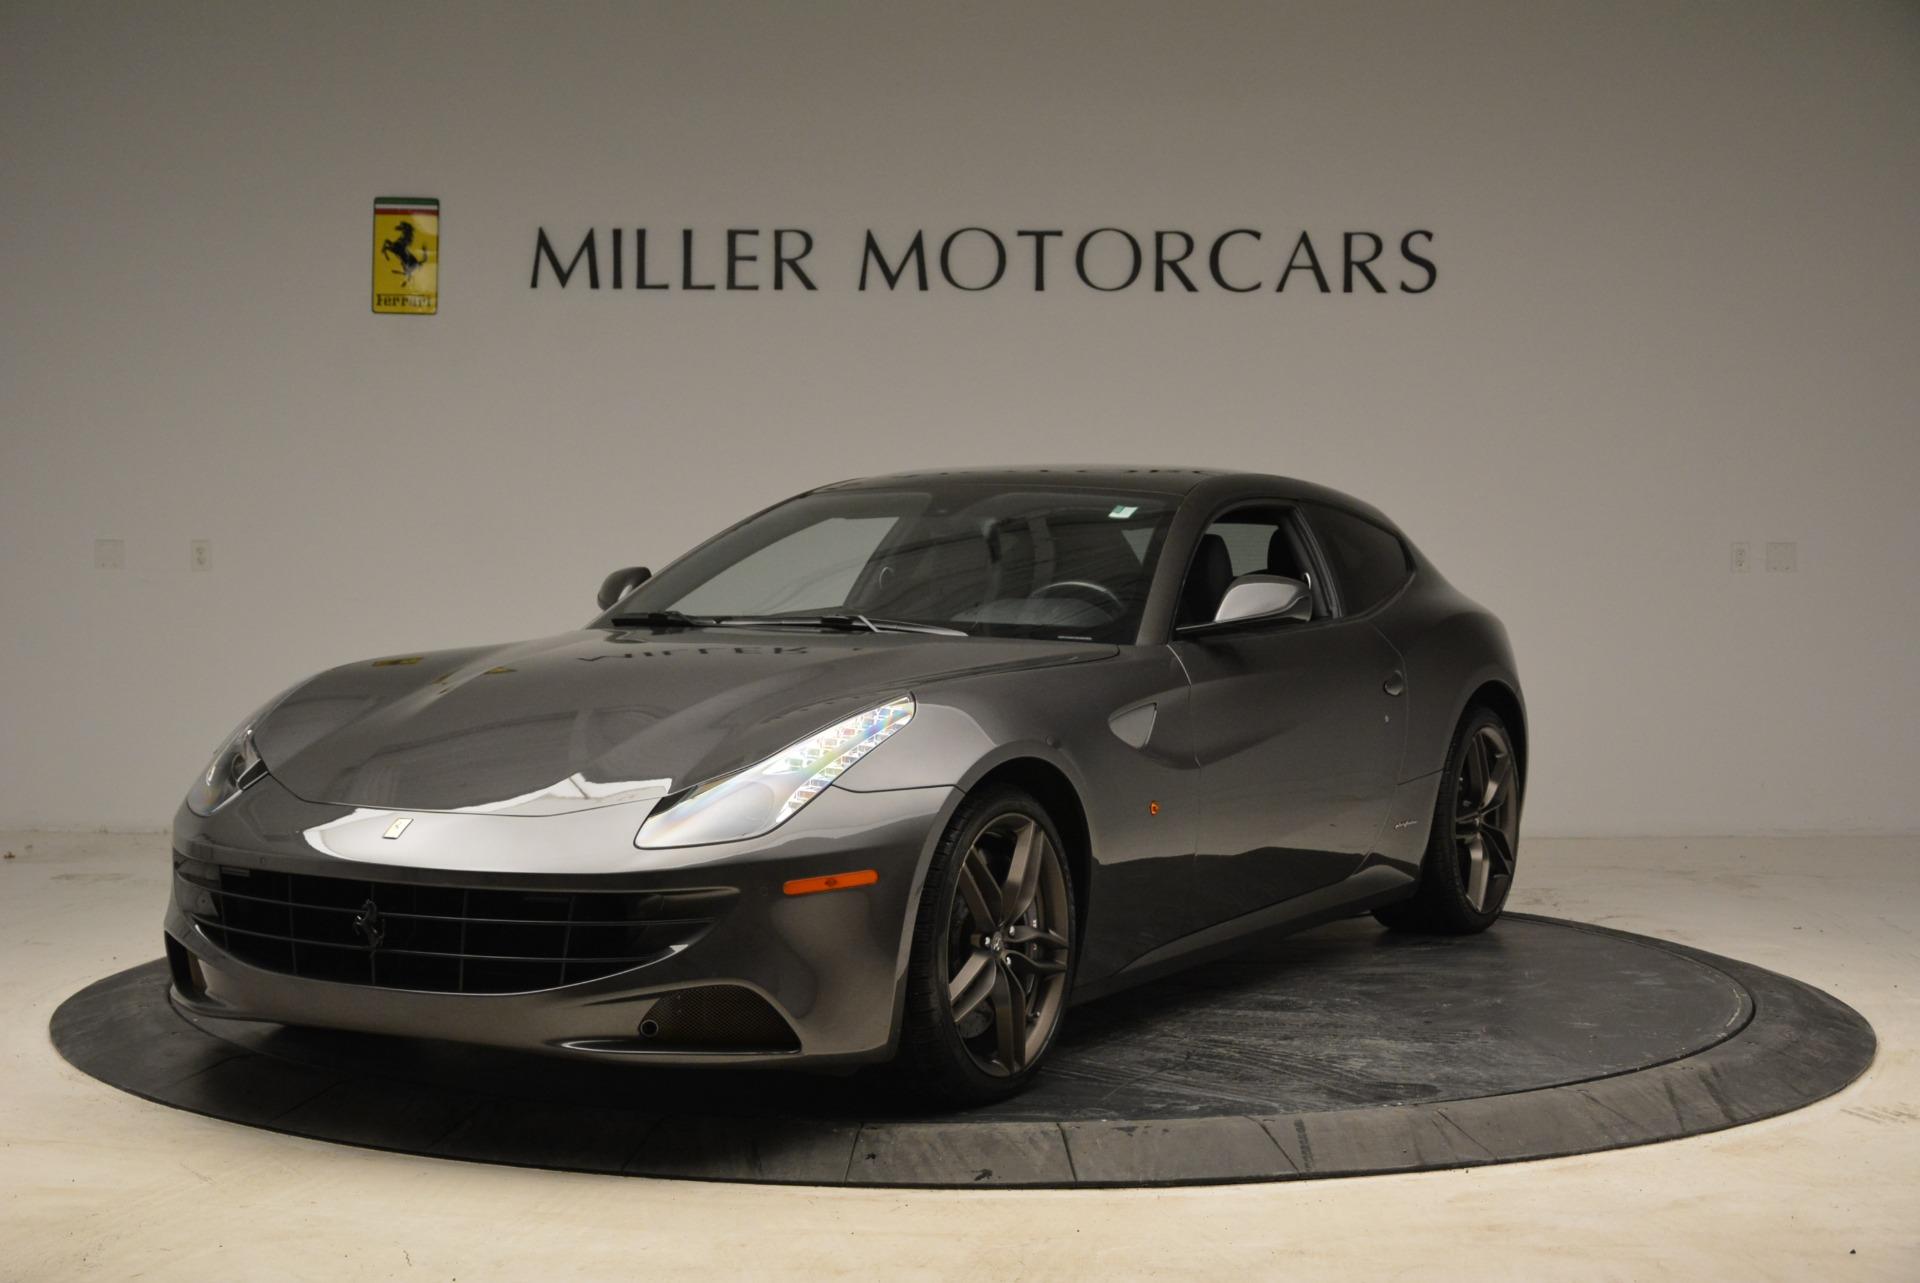 Used 2013 Ferrari FF for sale Sold at McLaren Greenwich in Greenwich CT 06830 1